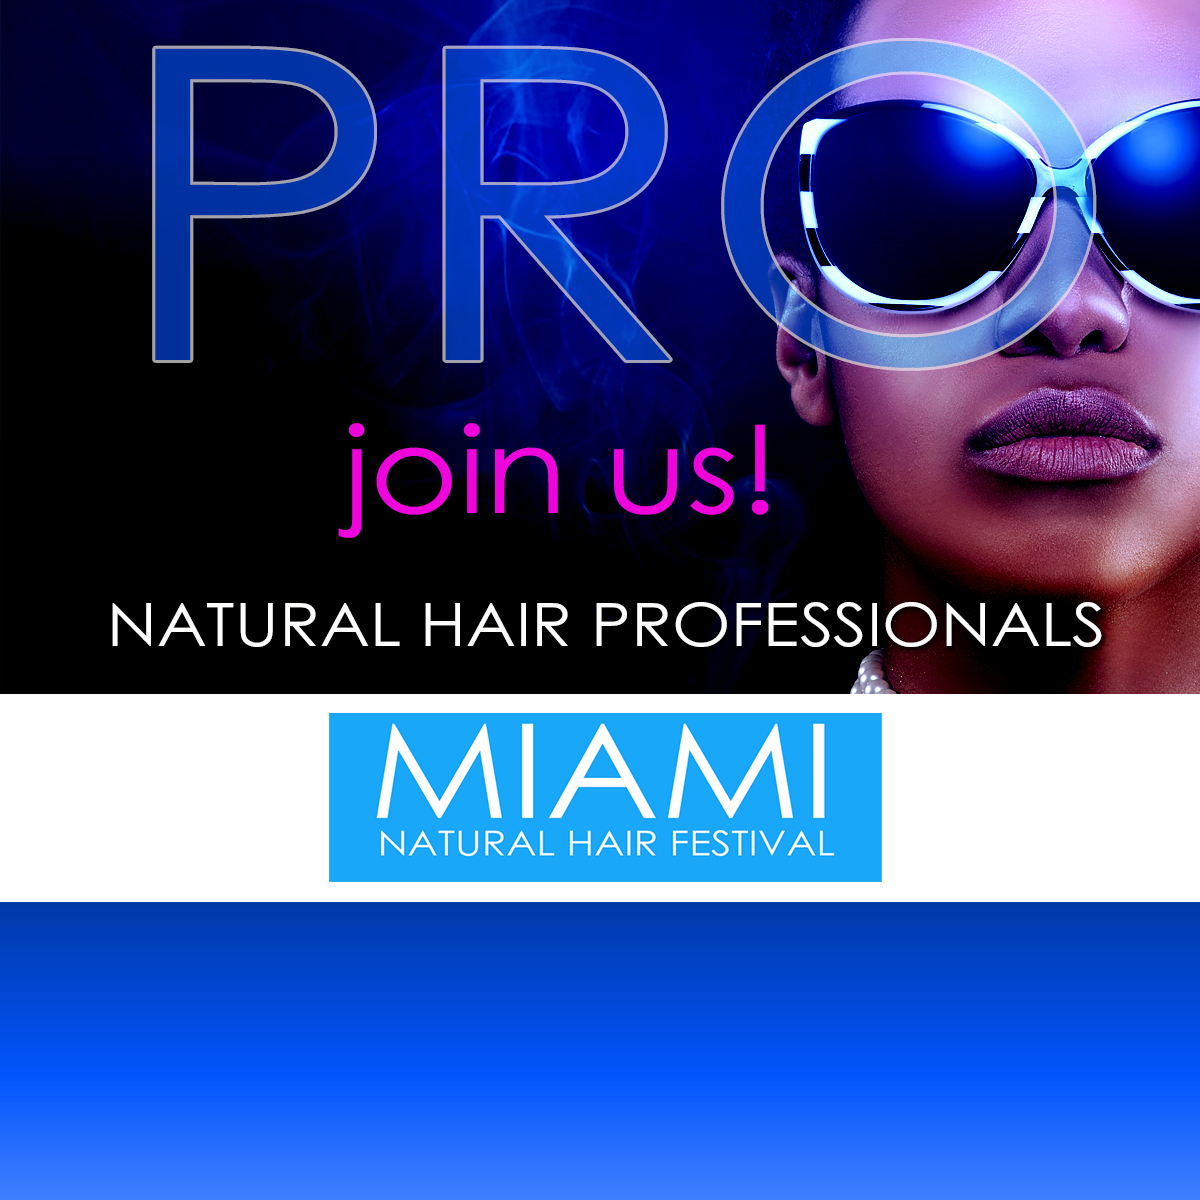 NATURAL HAIR FEST MIAMI NATURAL HAIR PROFESSIONALS